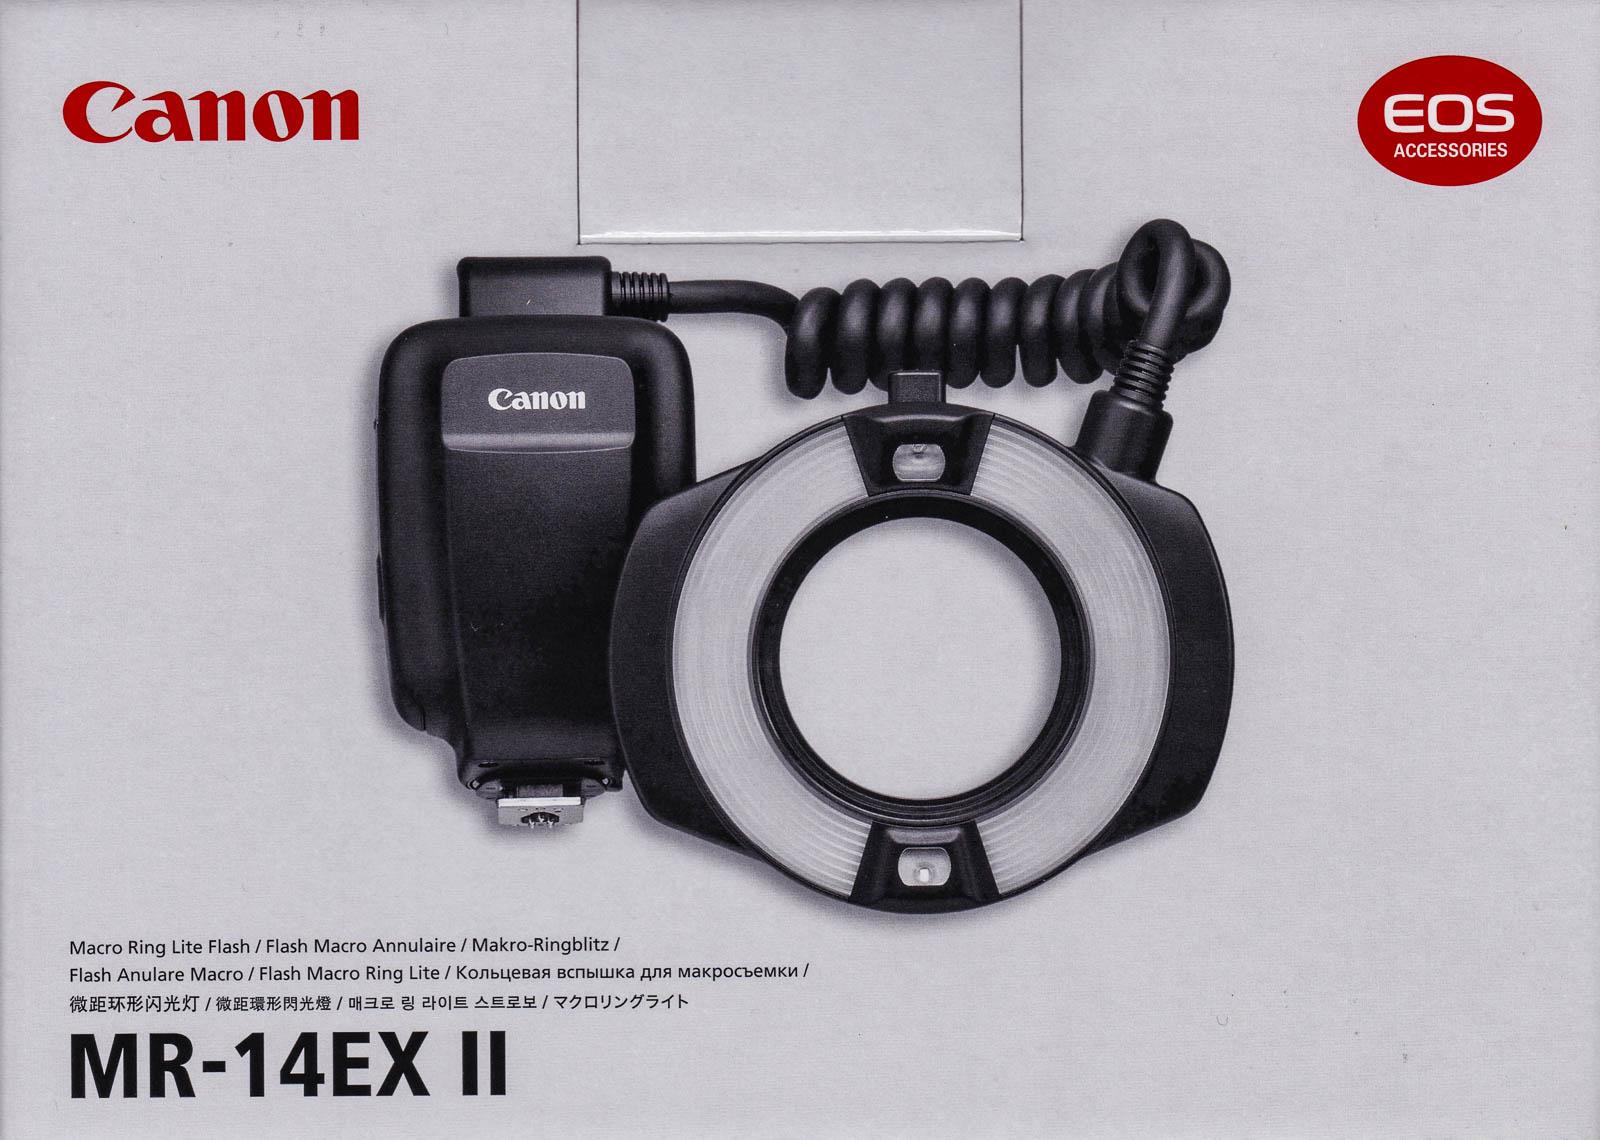 canon macro ring lite mr 14ex ii manual